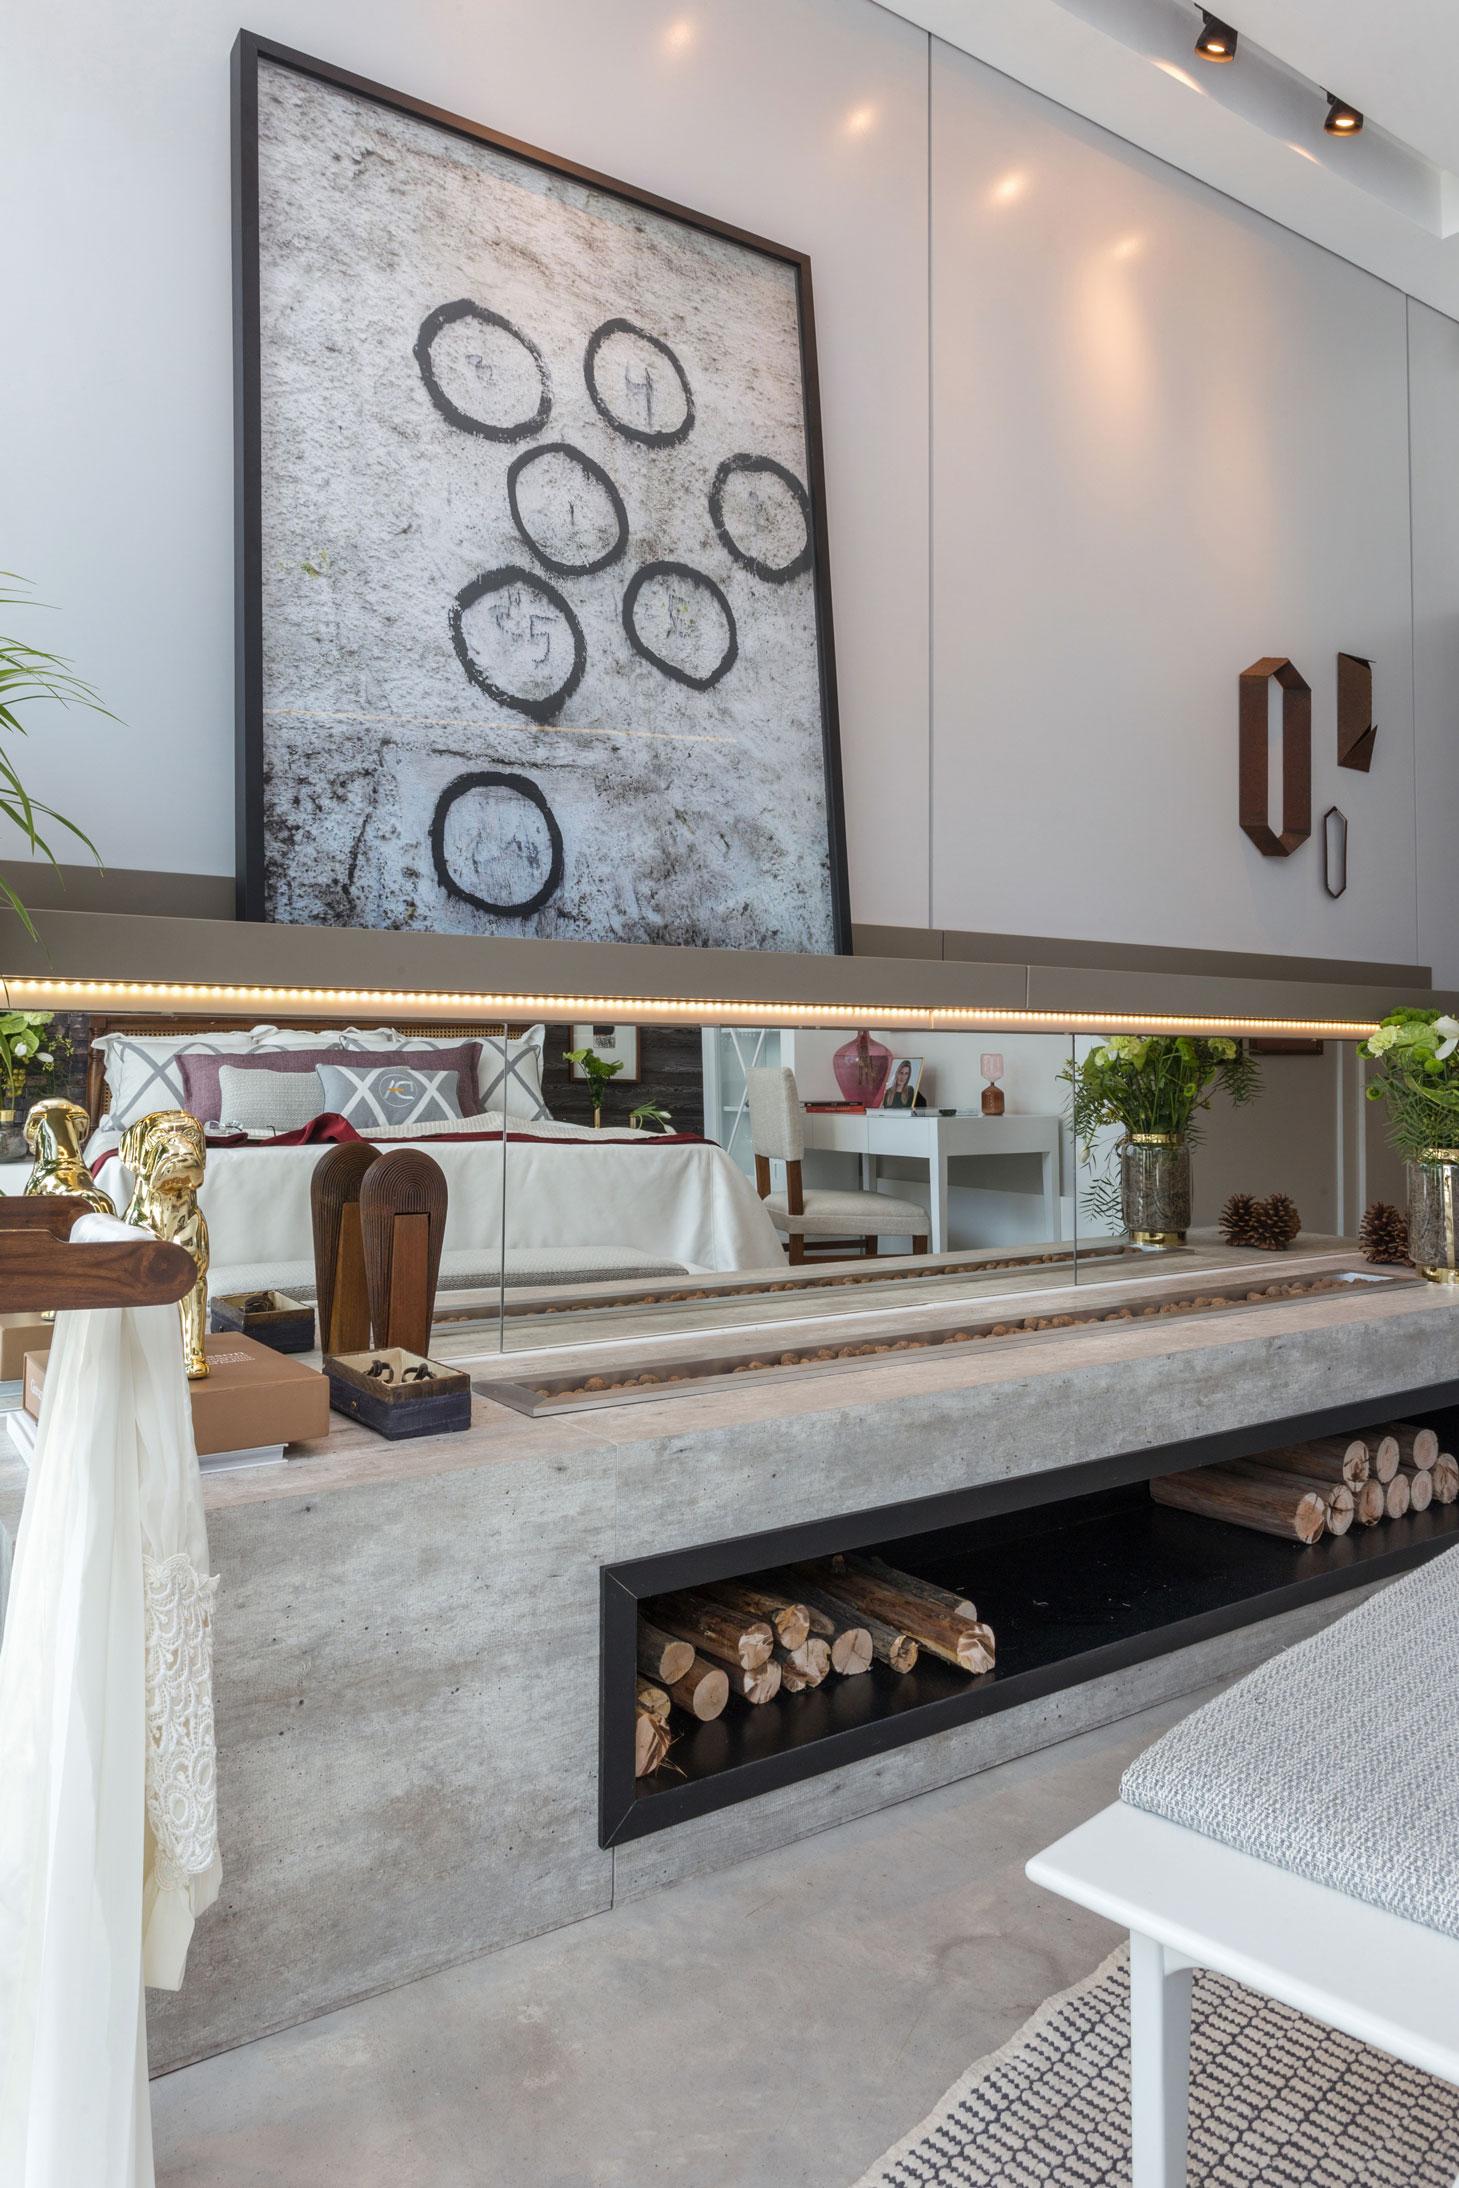 folhagens e tons esverdeados para d cor primaveril art et decor. Black Bedroom Furniture Sets. Home Design Ideas